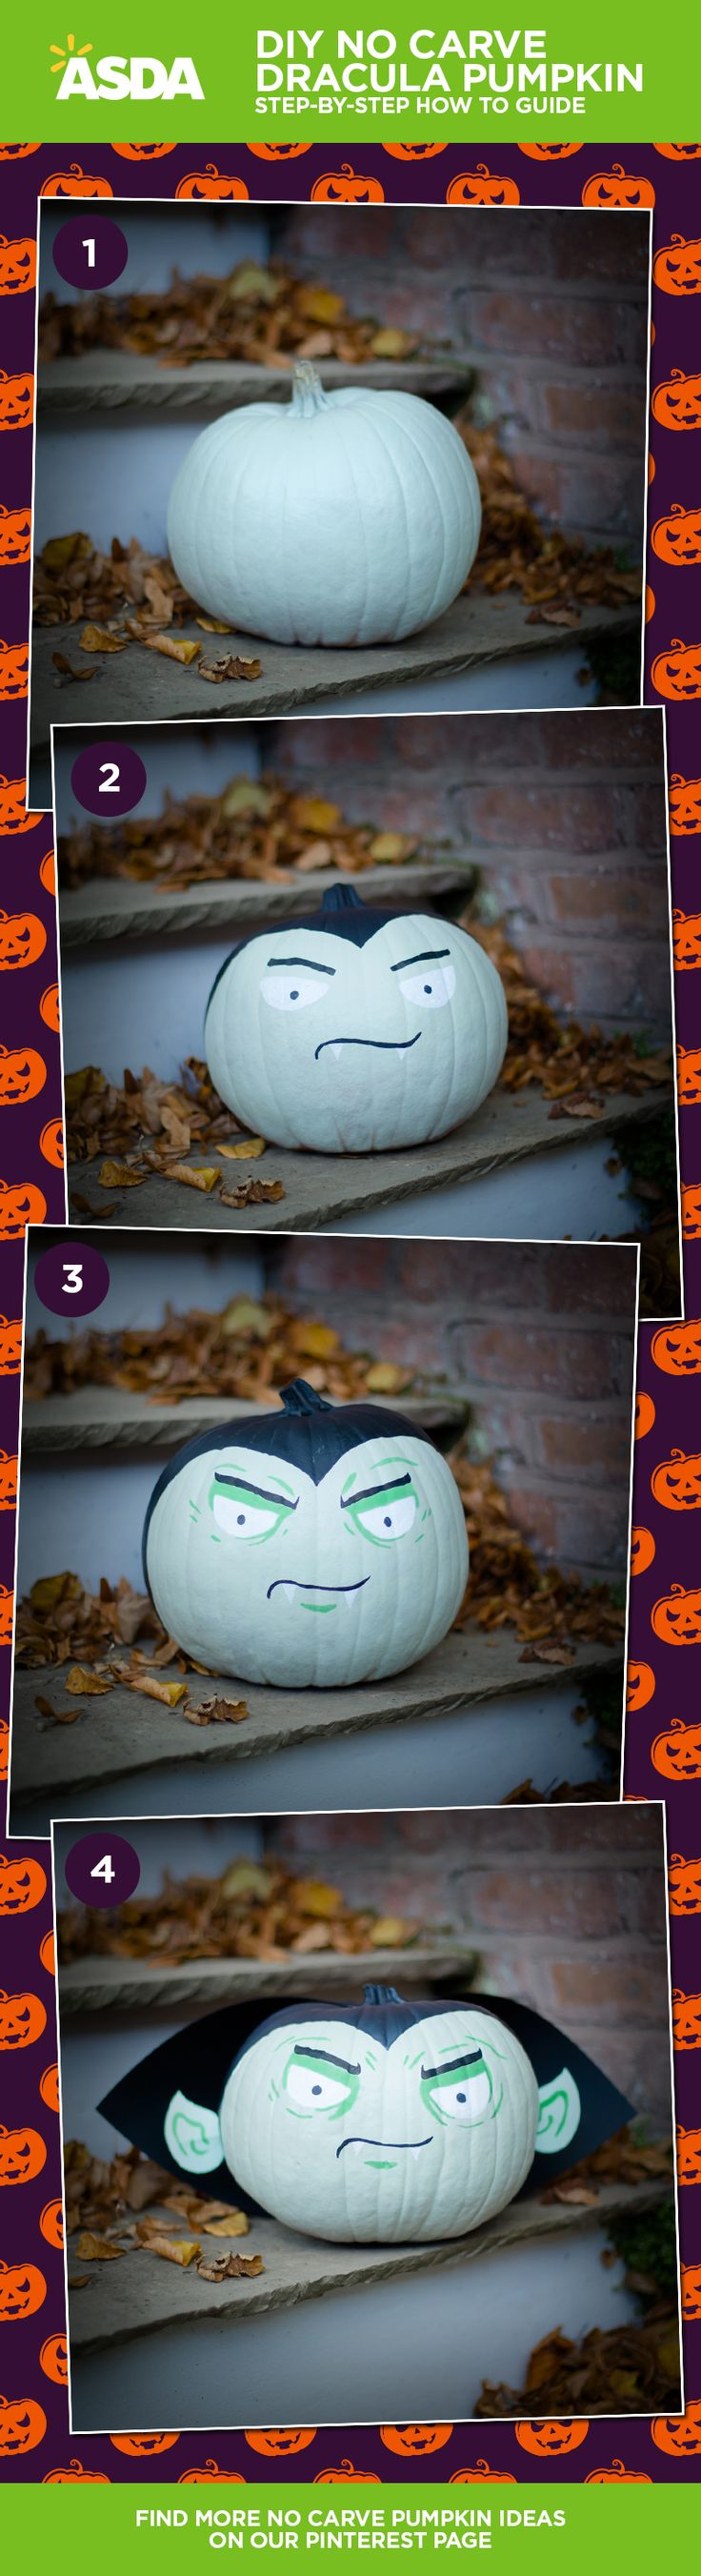 Halloween Cake Decorations Asda : 1000+ images about Asda Halloween Fun on Pinterest ...